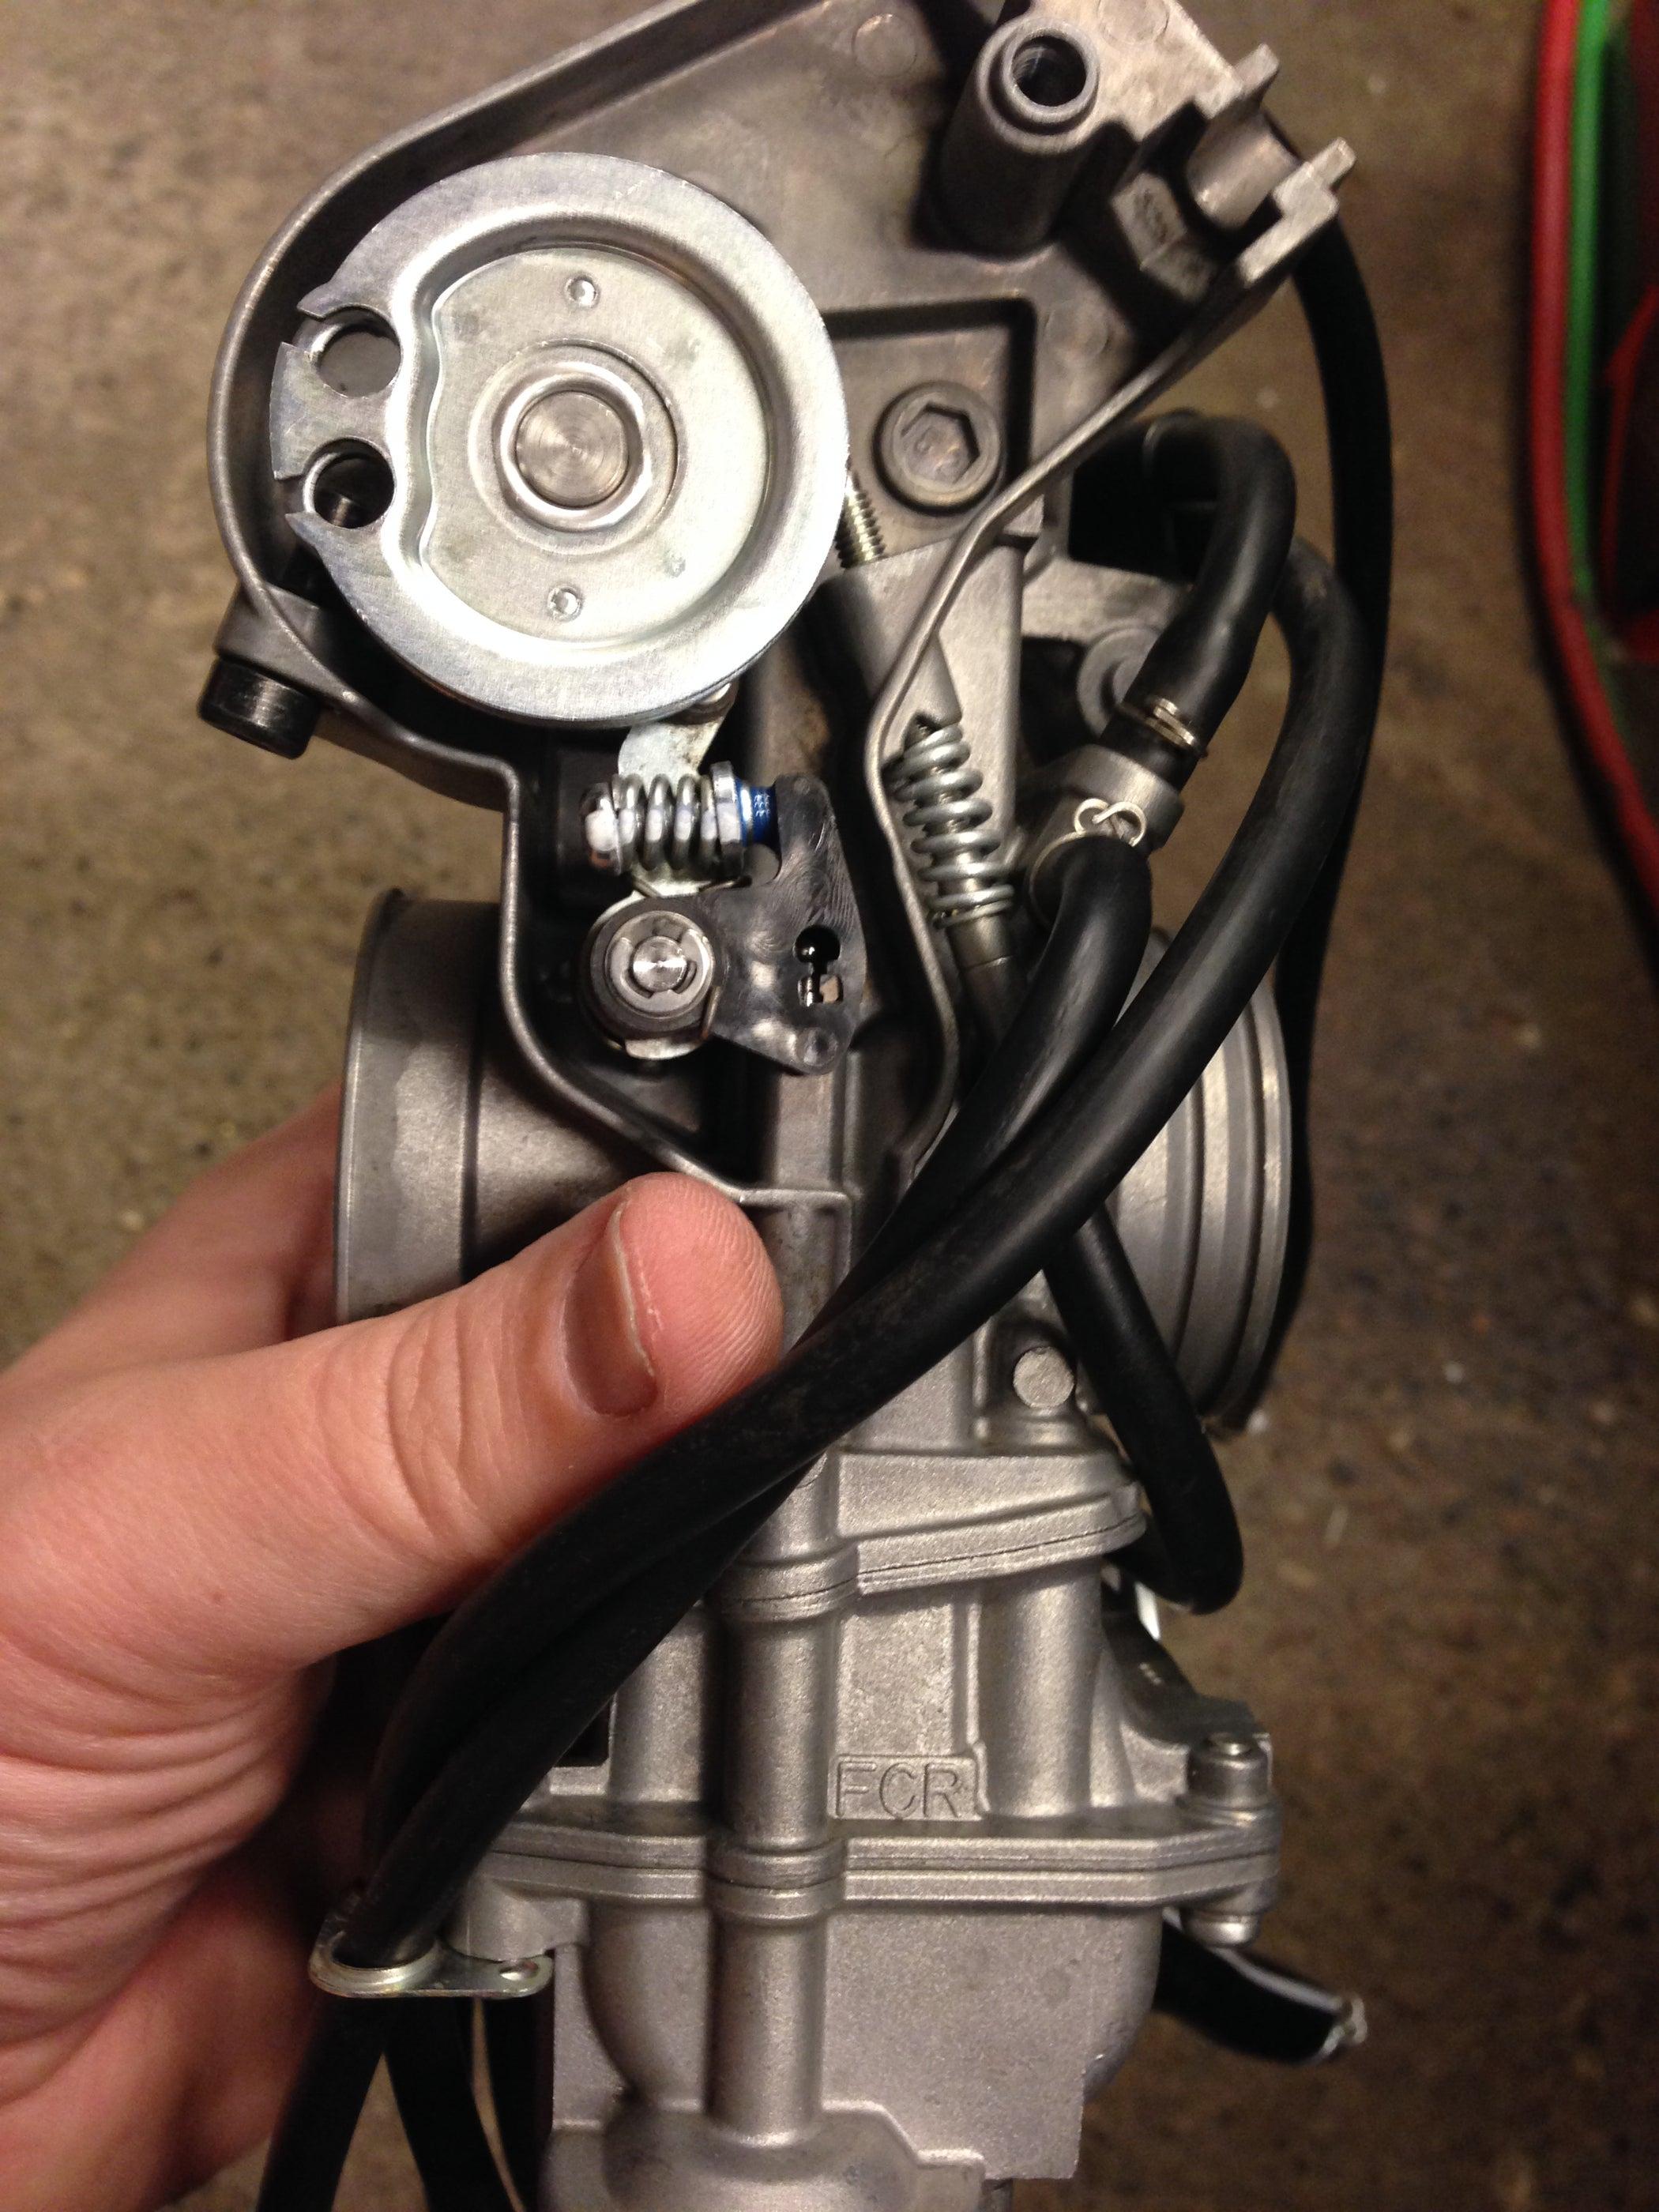 Fixing The Dreaded Lean Bog On Keihin Fcr Carburetors 4 Steps 2006 Xr650l Wiring Diagram